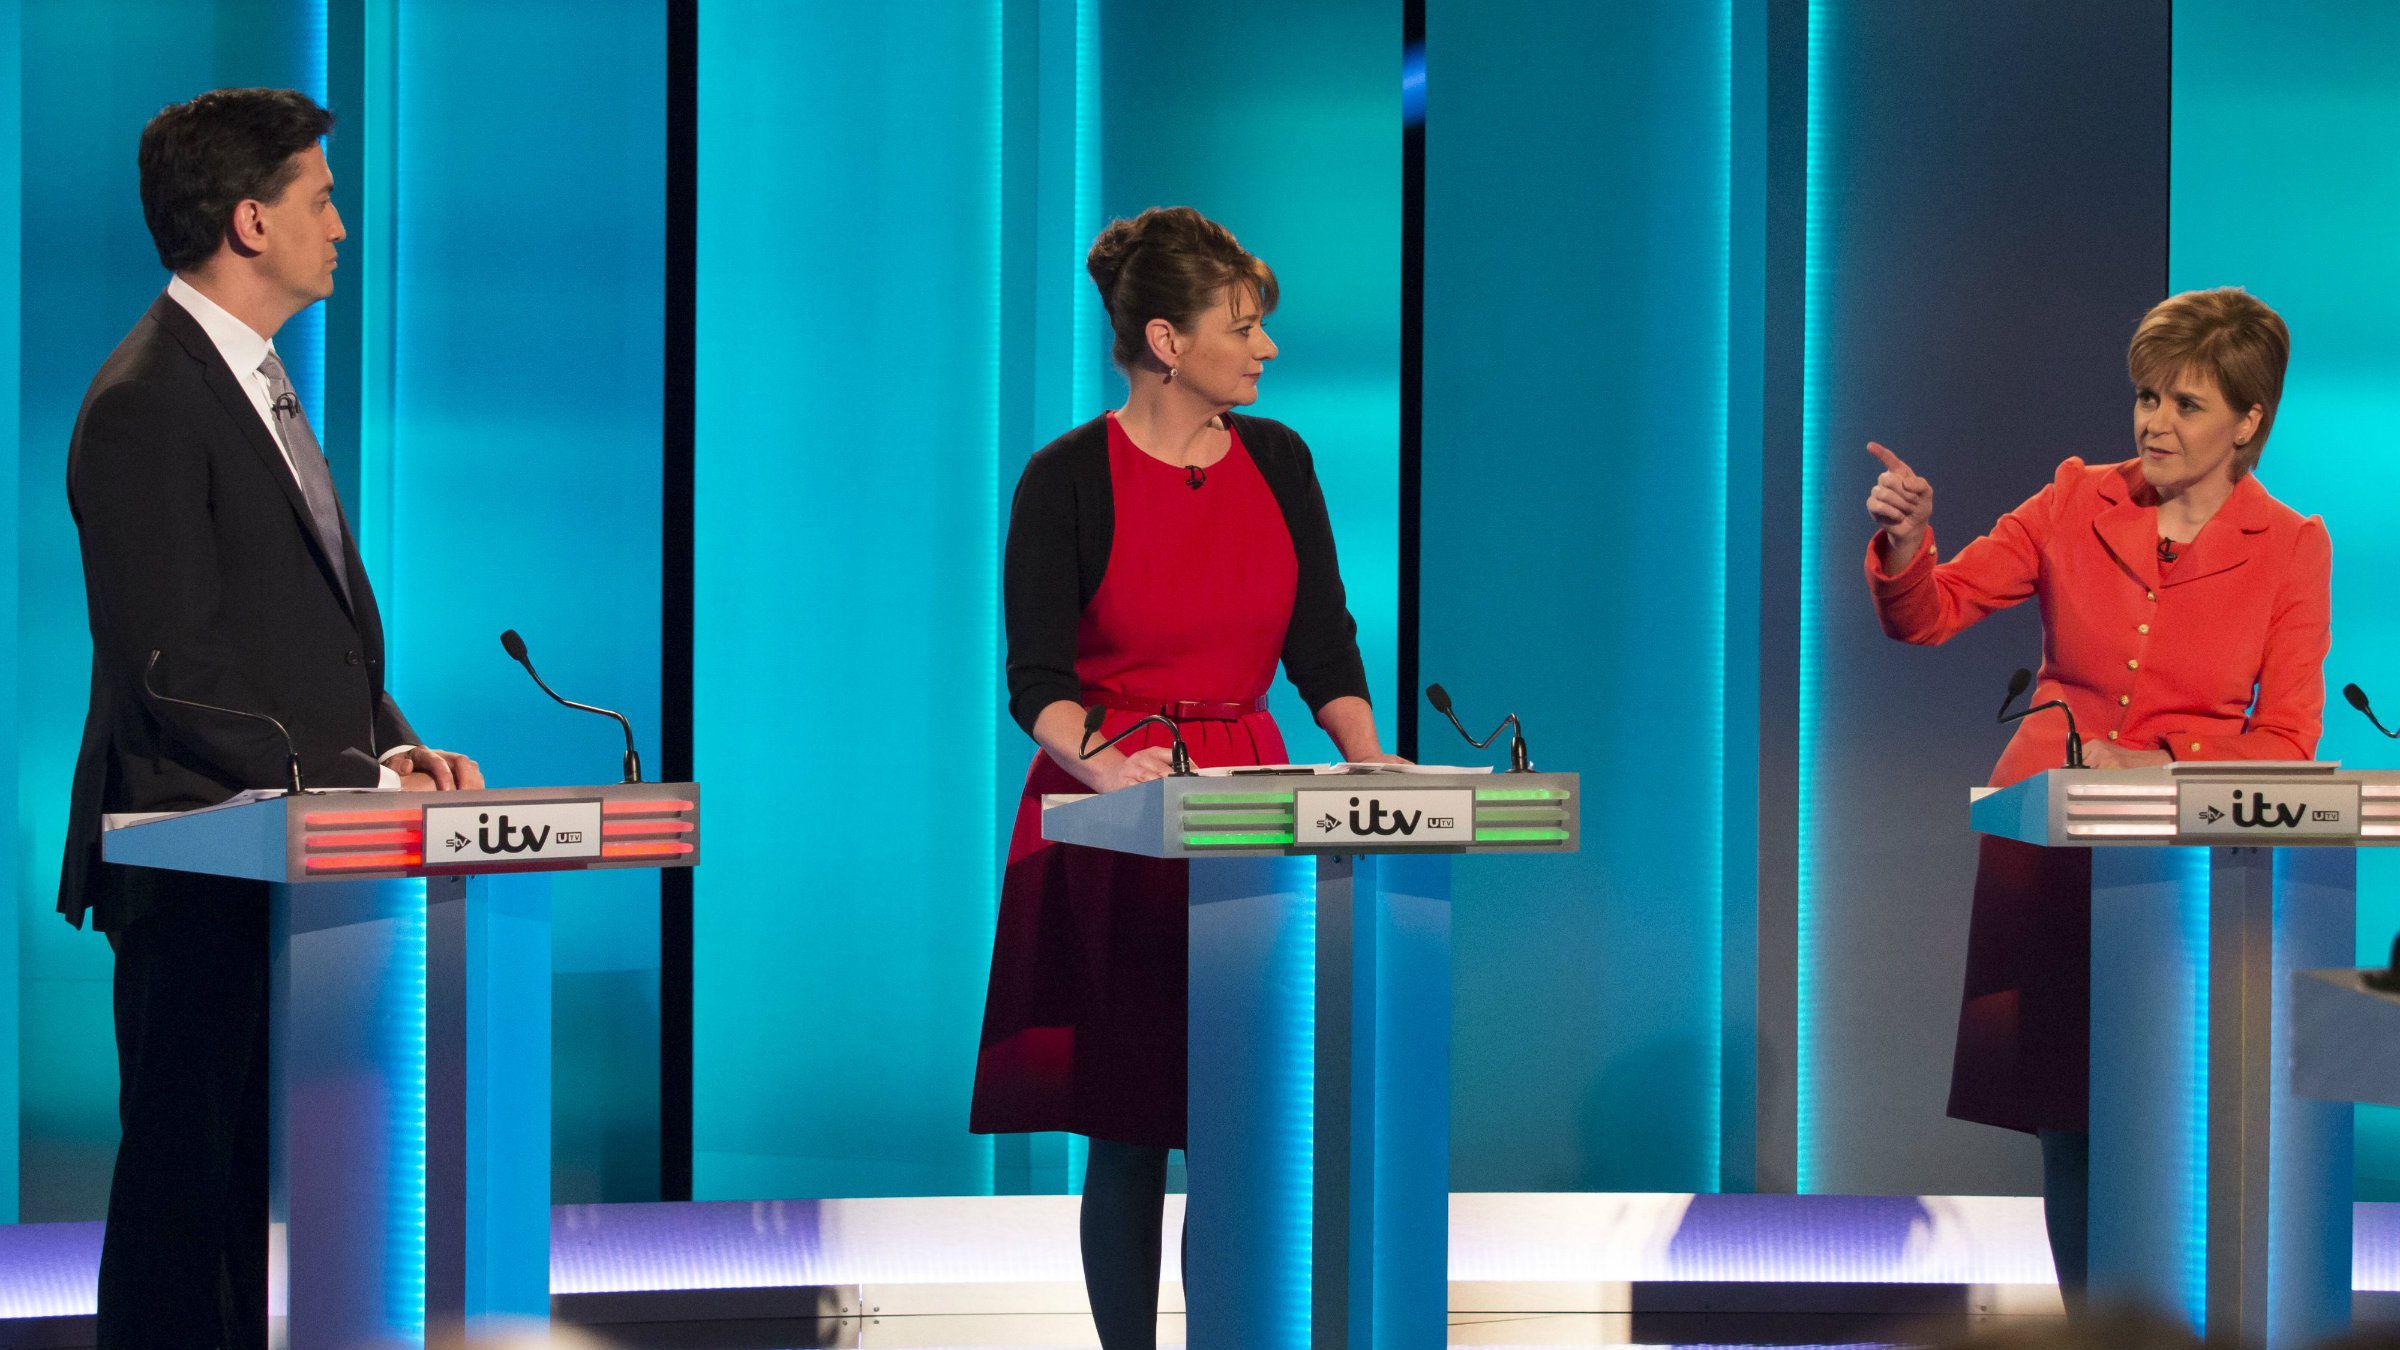 Labour leader Ed Miliband, Plaid Cymru leader Leanne Wood and Scottish National Party's Leader Nicola Sturgeon